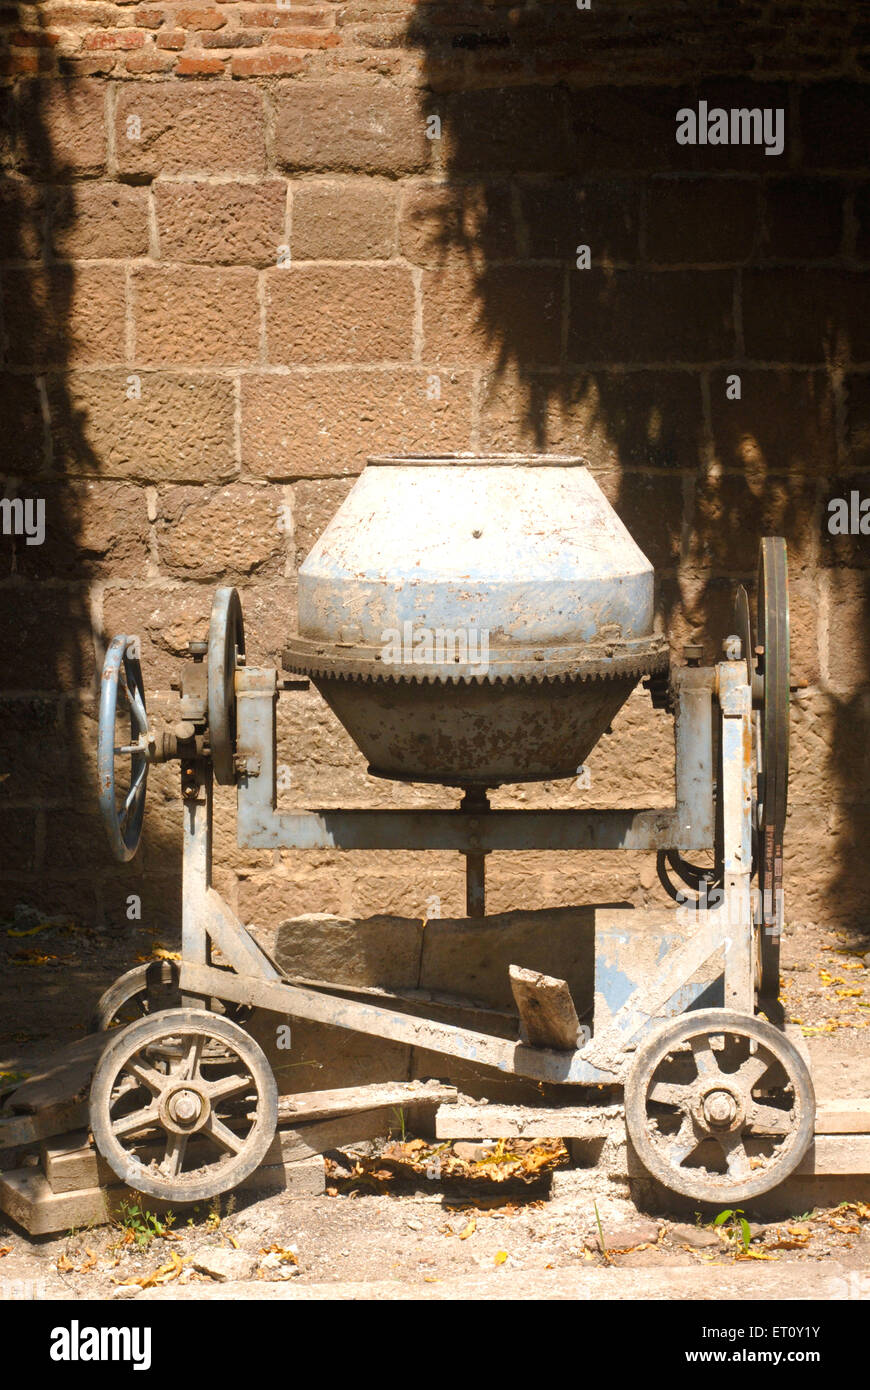 Small hand mixer of cement concrete ; Pune ; Maharashtra ; India - Stock Image